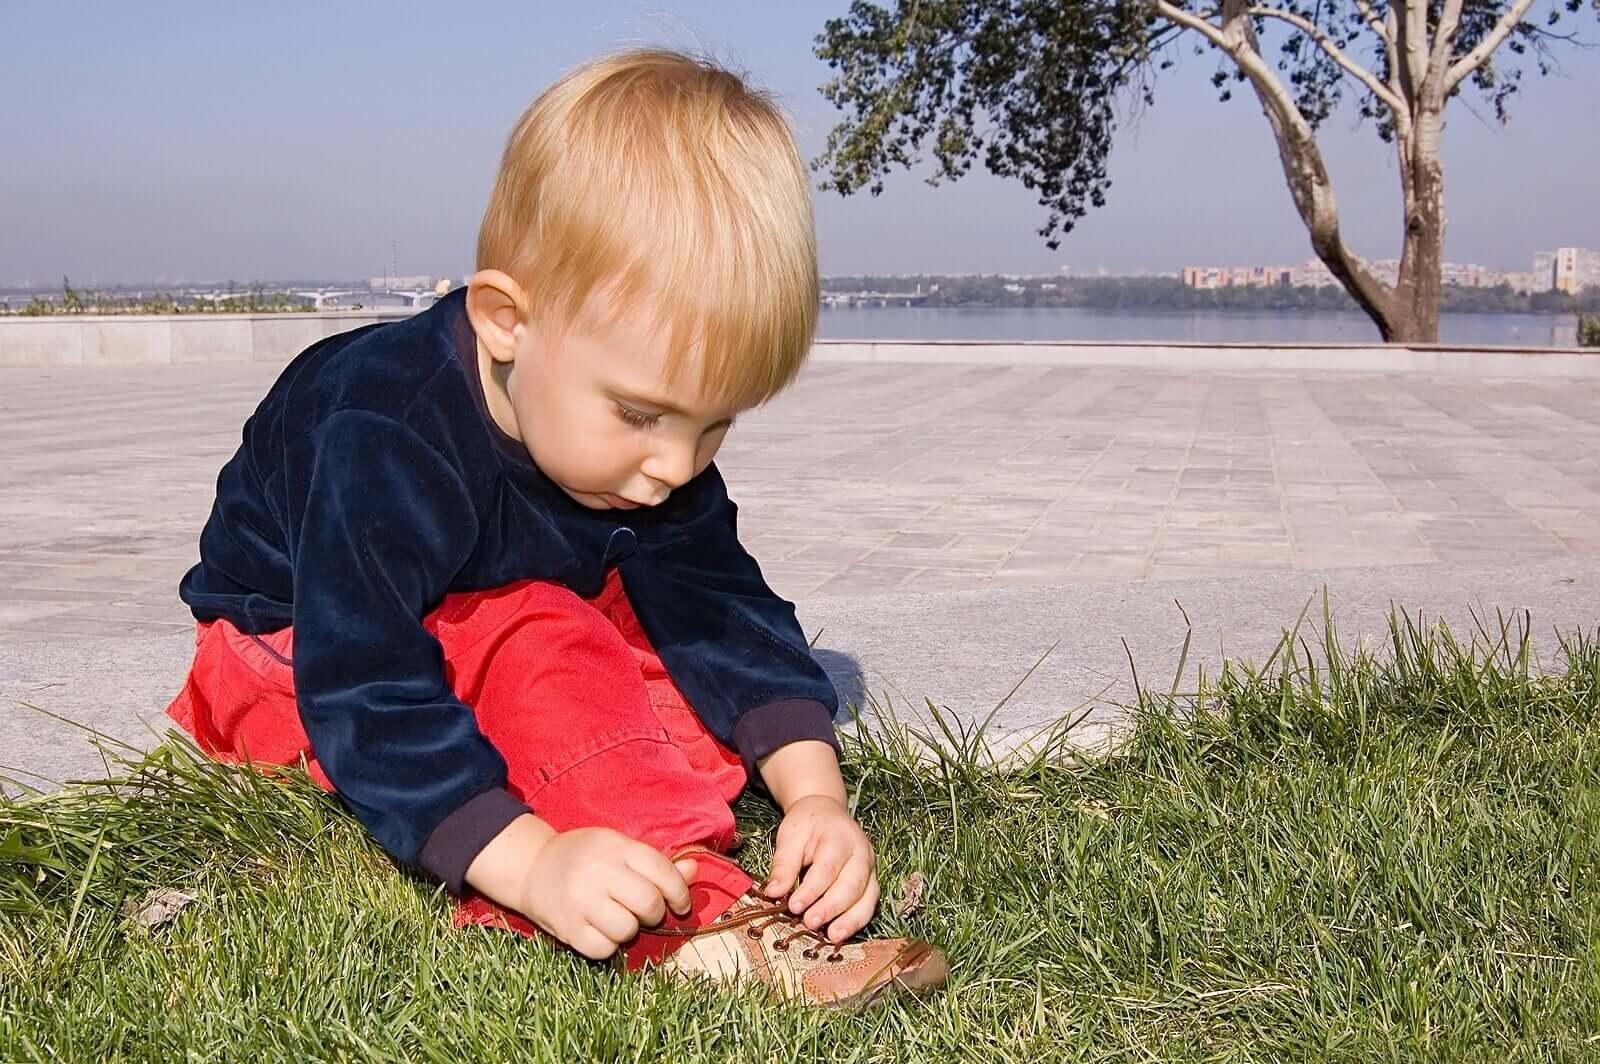 Personality Development in Childhood